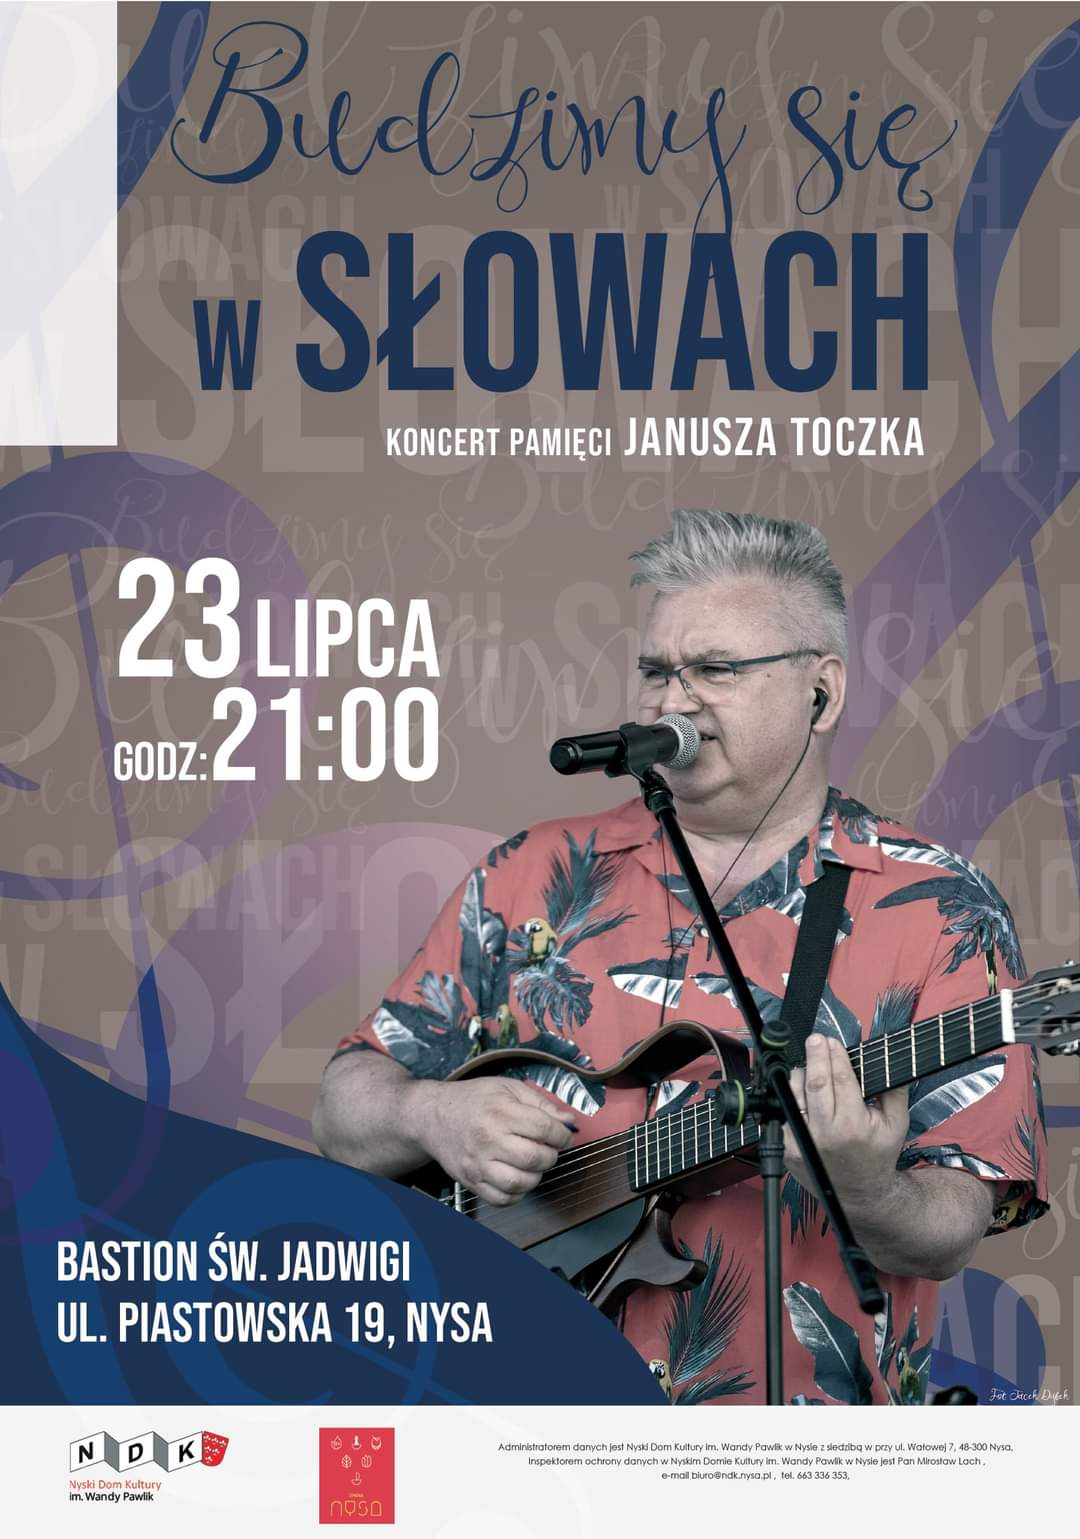 Koncert pamięci Janusza Toczka